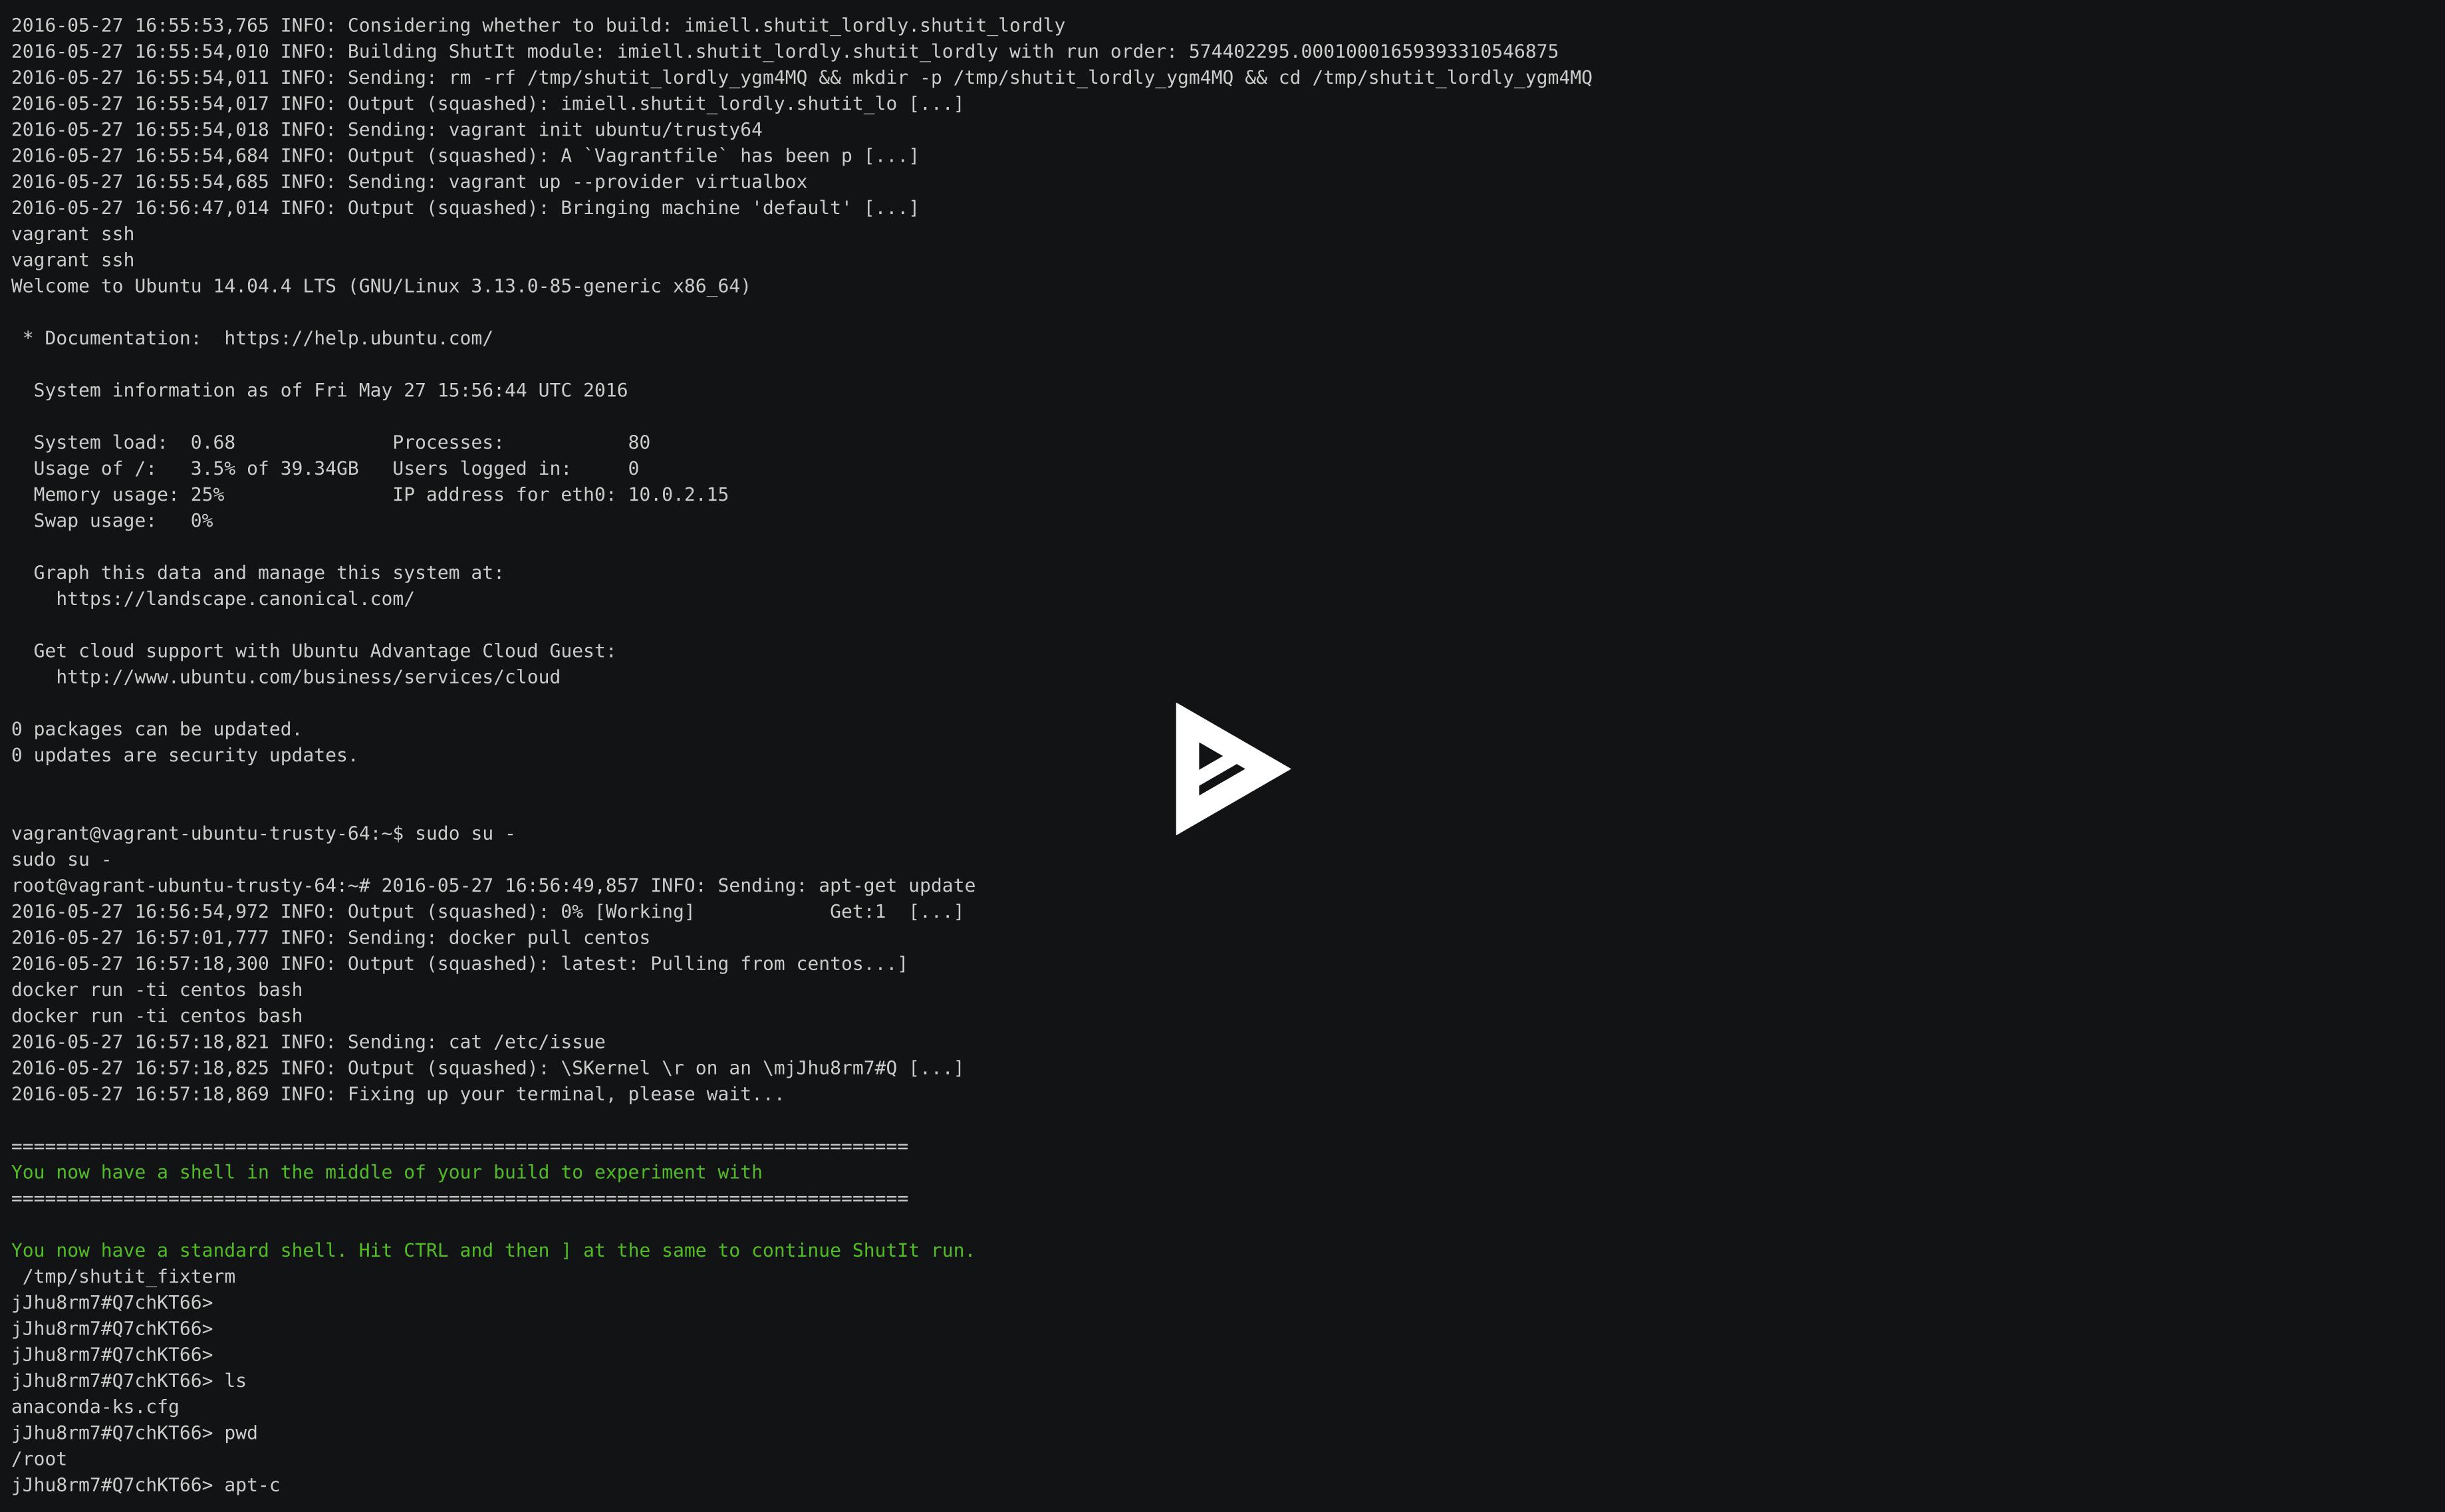 Docker on Ubuntu VM running a CentOS image